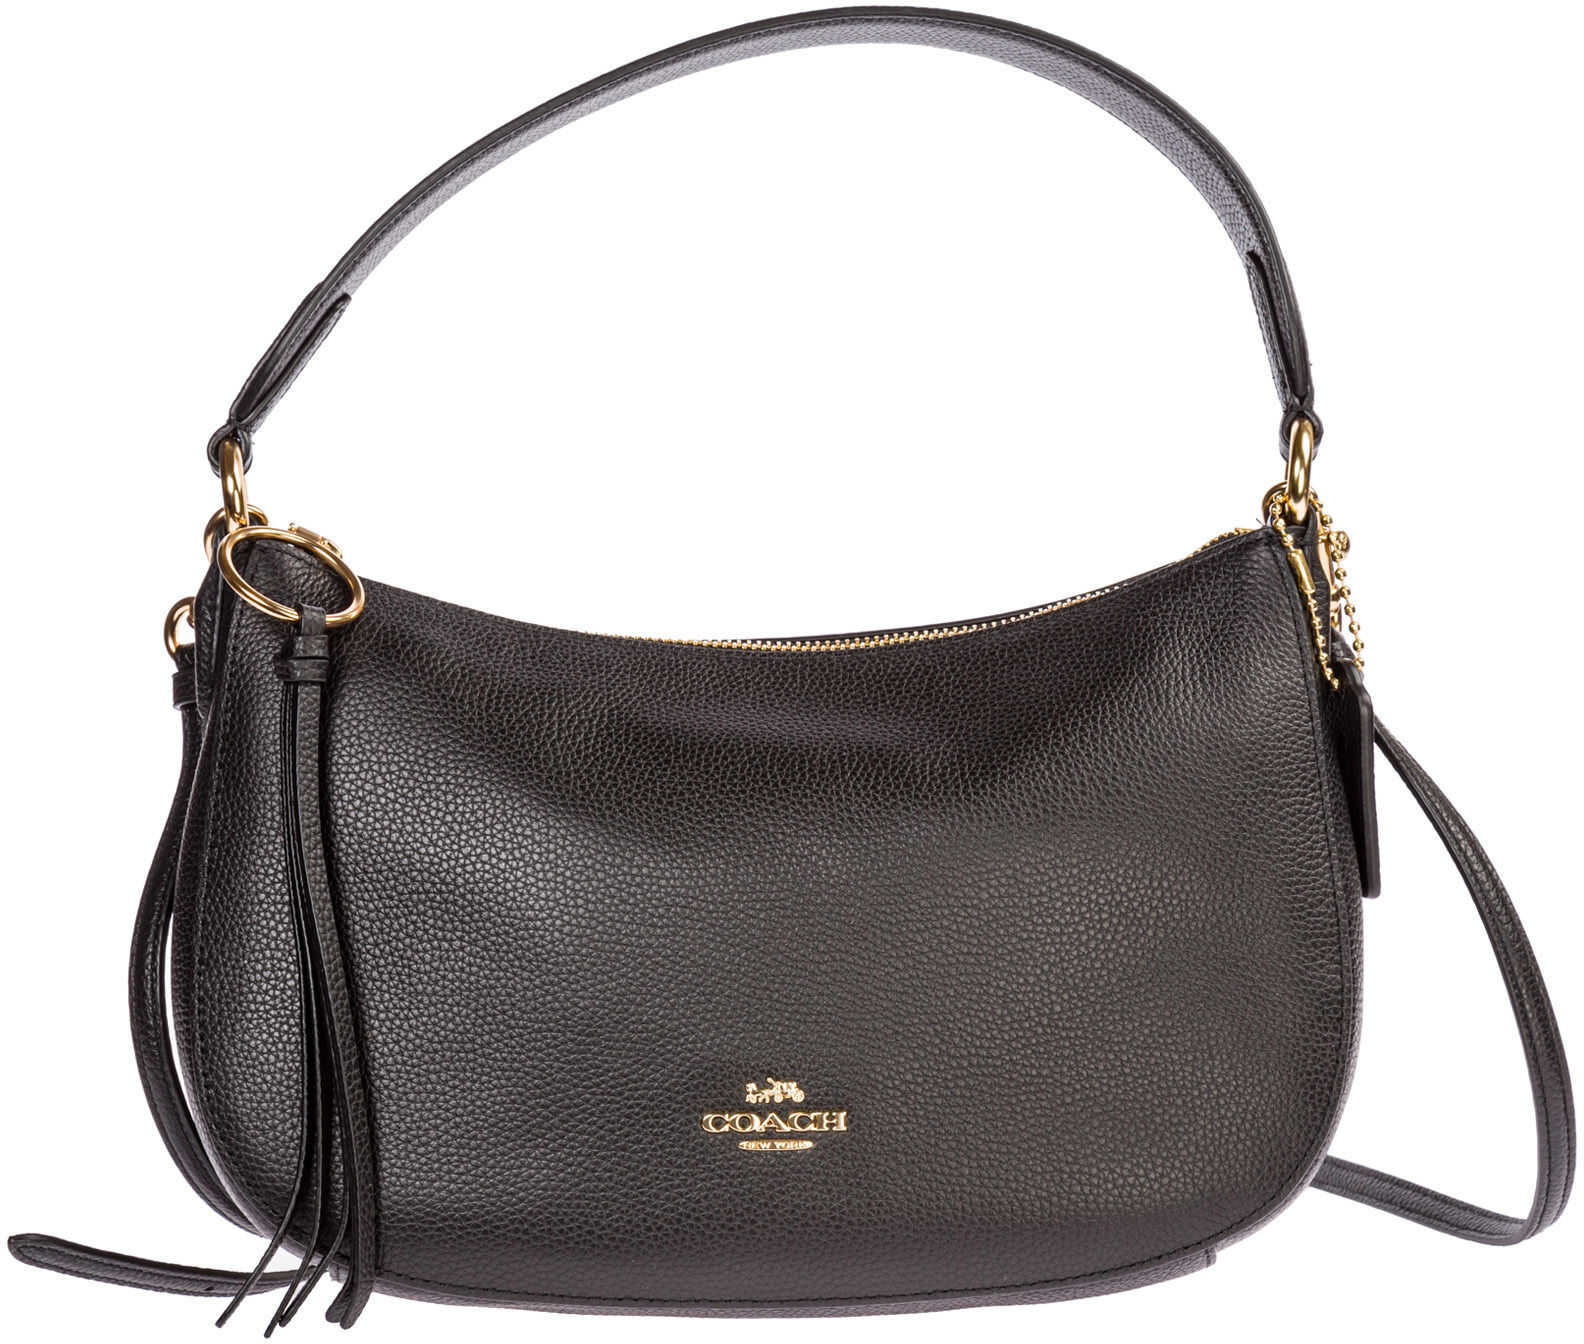 COACH Bag Sutton Black